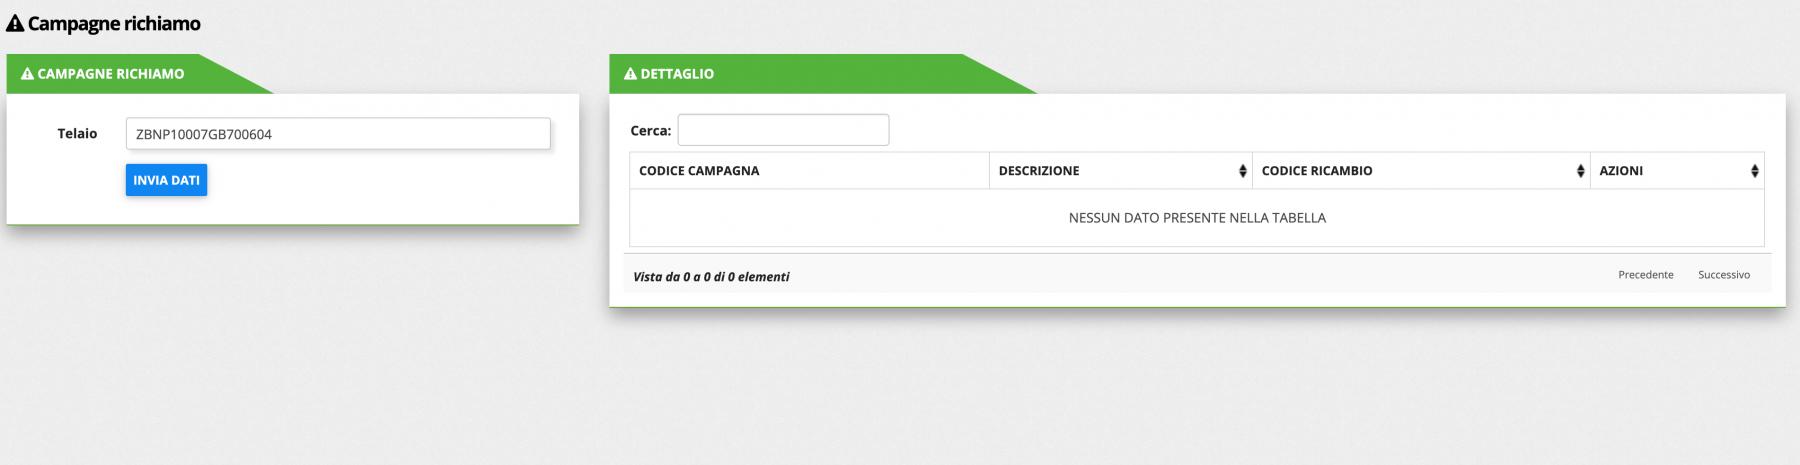 Campagna-richiamo-dealer-1